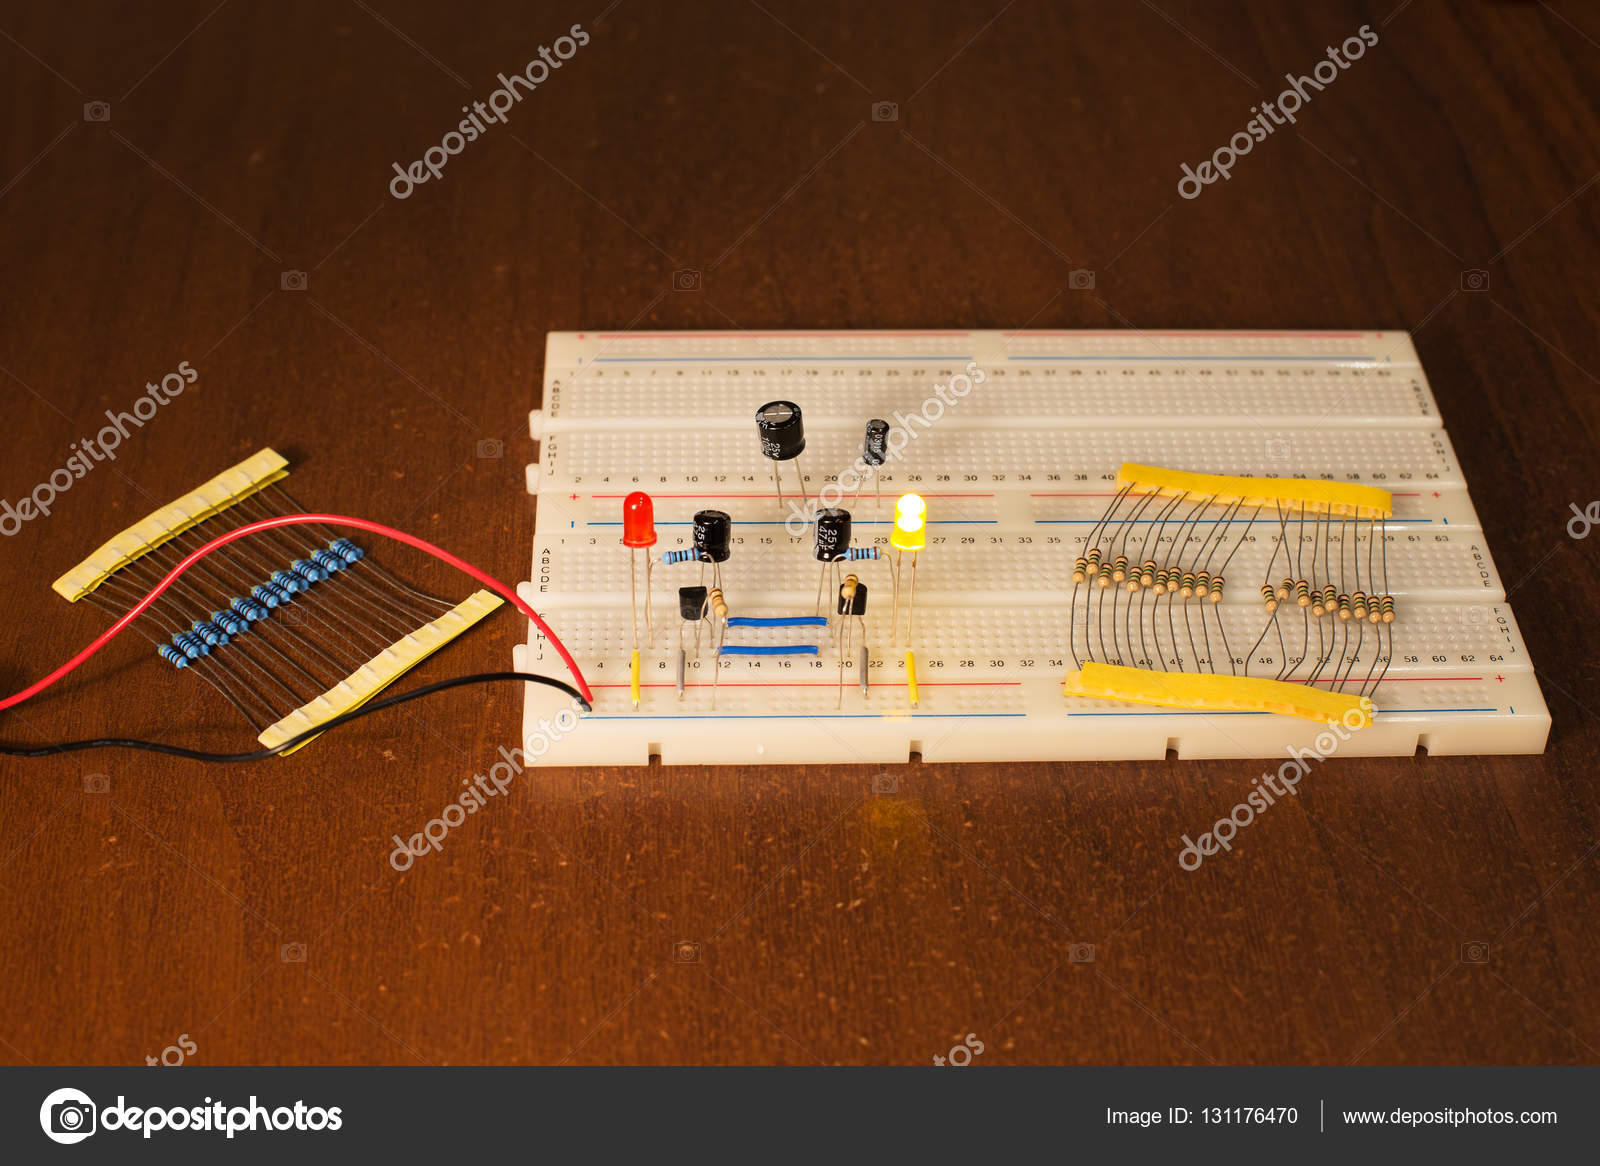 Oscillator Circuit On Prototyping Board Breadboard Stock Photo Basic Oscillatory Circuits Electronic And Diagram